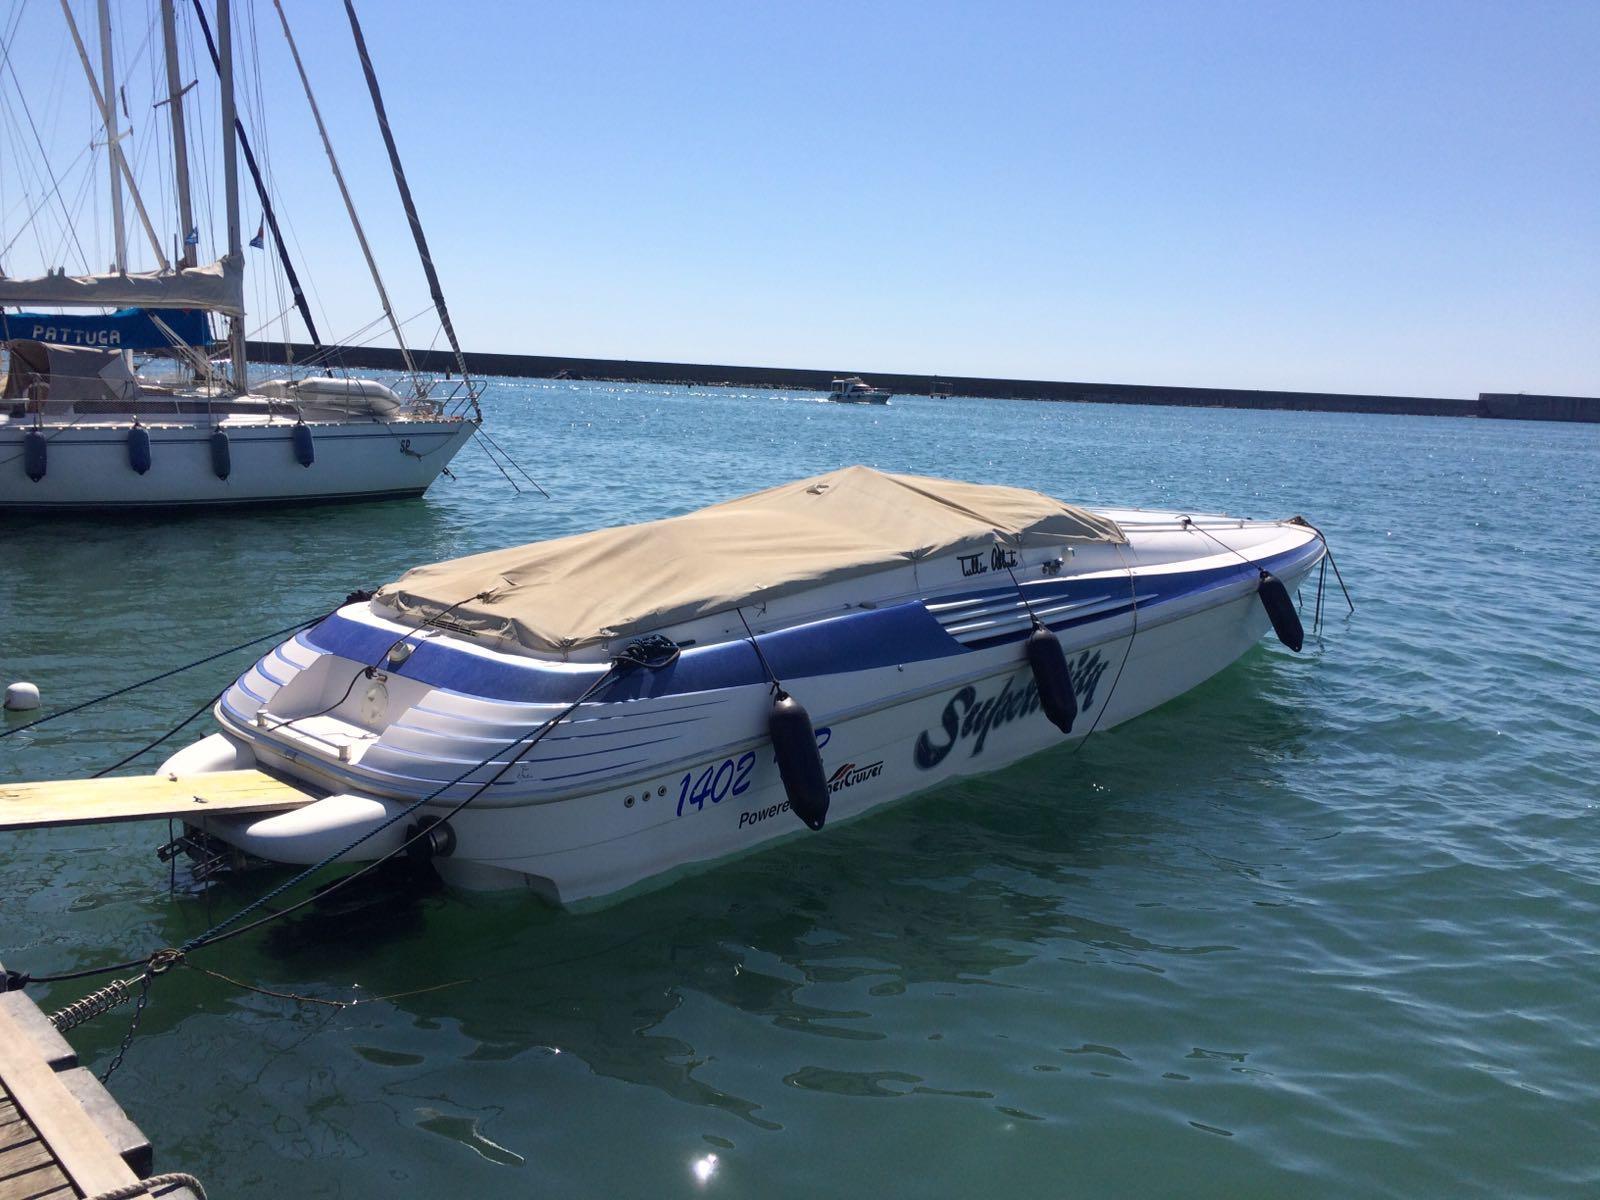 1989 Tullio Abbate 36 Superiority Power Boat For Sale